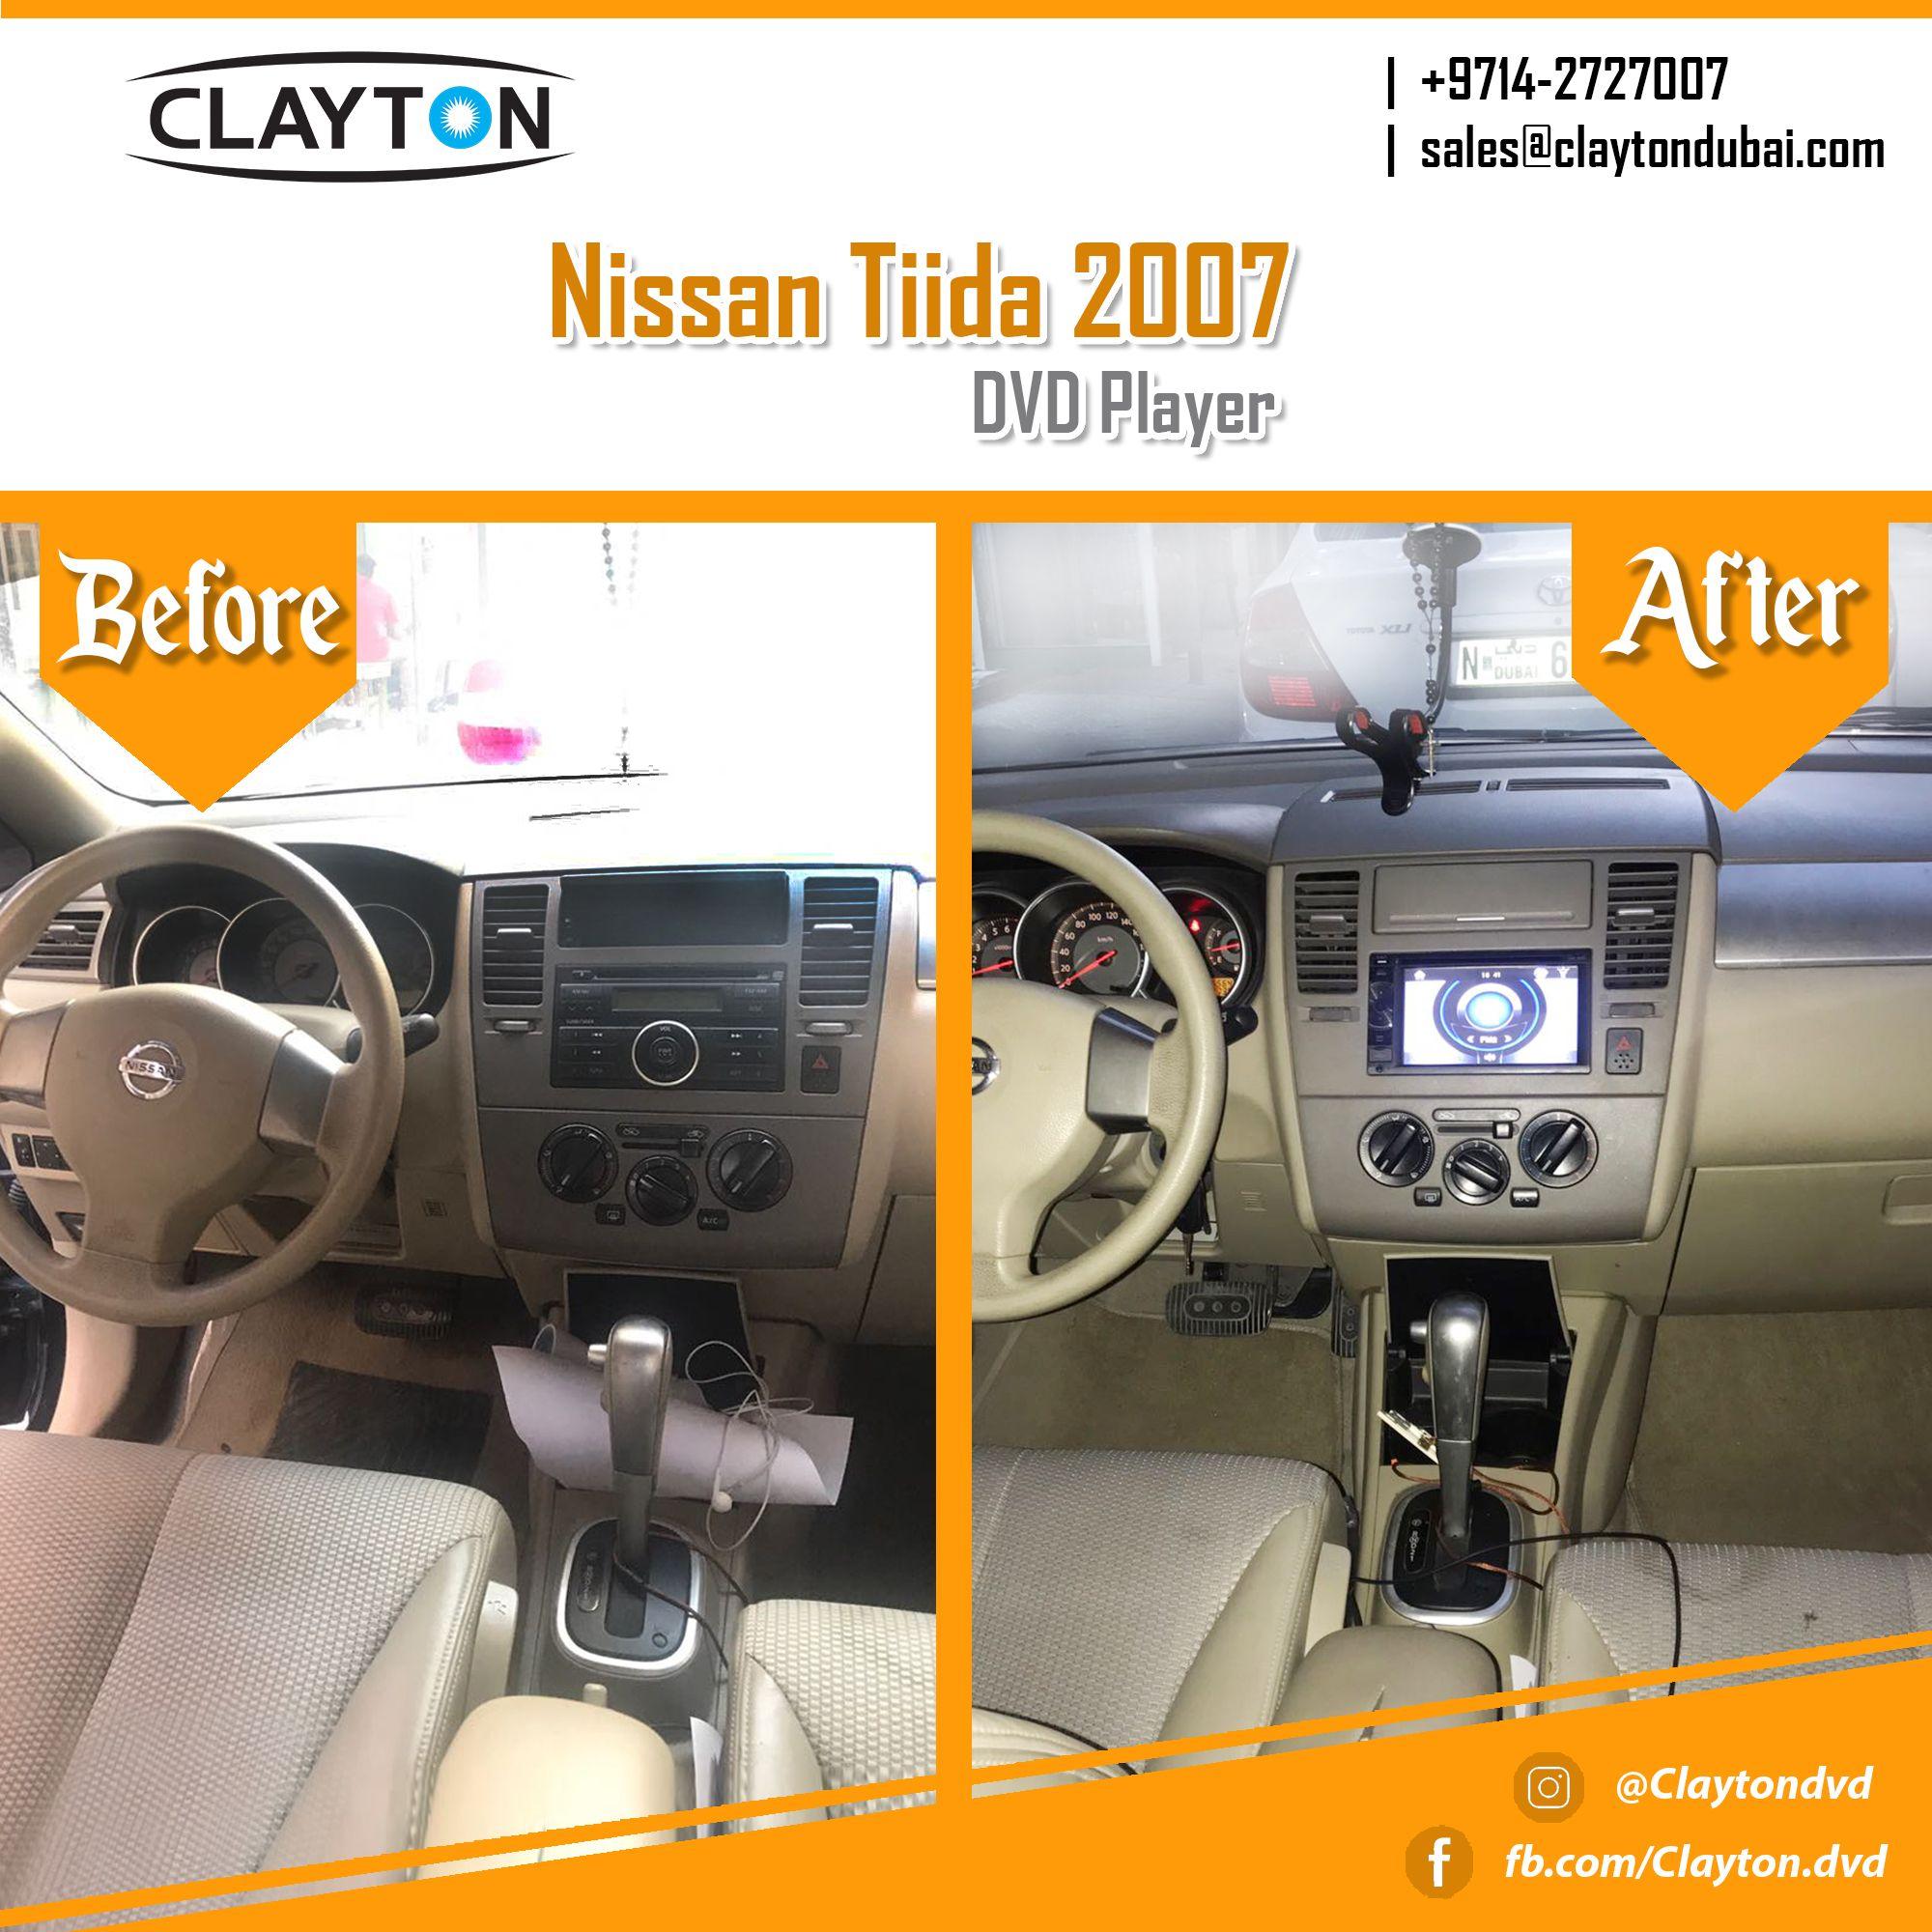 http://www.claytondubai.com/2-din-special/nissan-series/ #nissan #tiida #dvd #player #before #after #navigation #gps #cargps #carnavi #dubai #clayton #car #uae #cardvd #dvds #cardvds